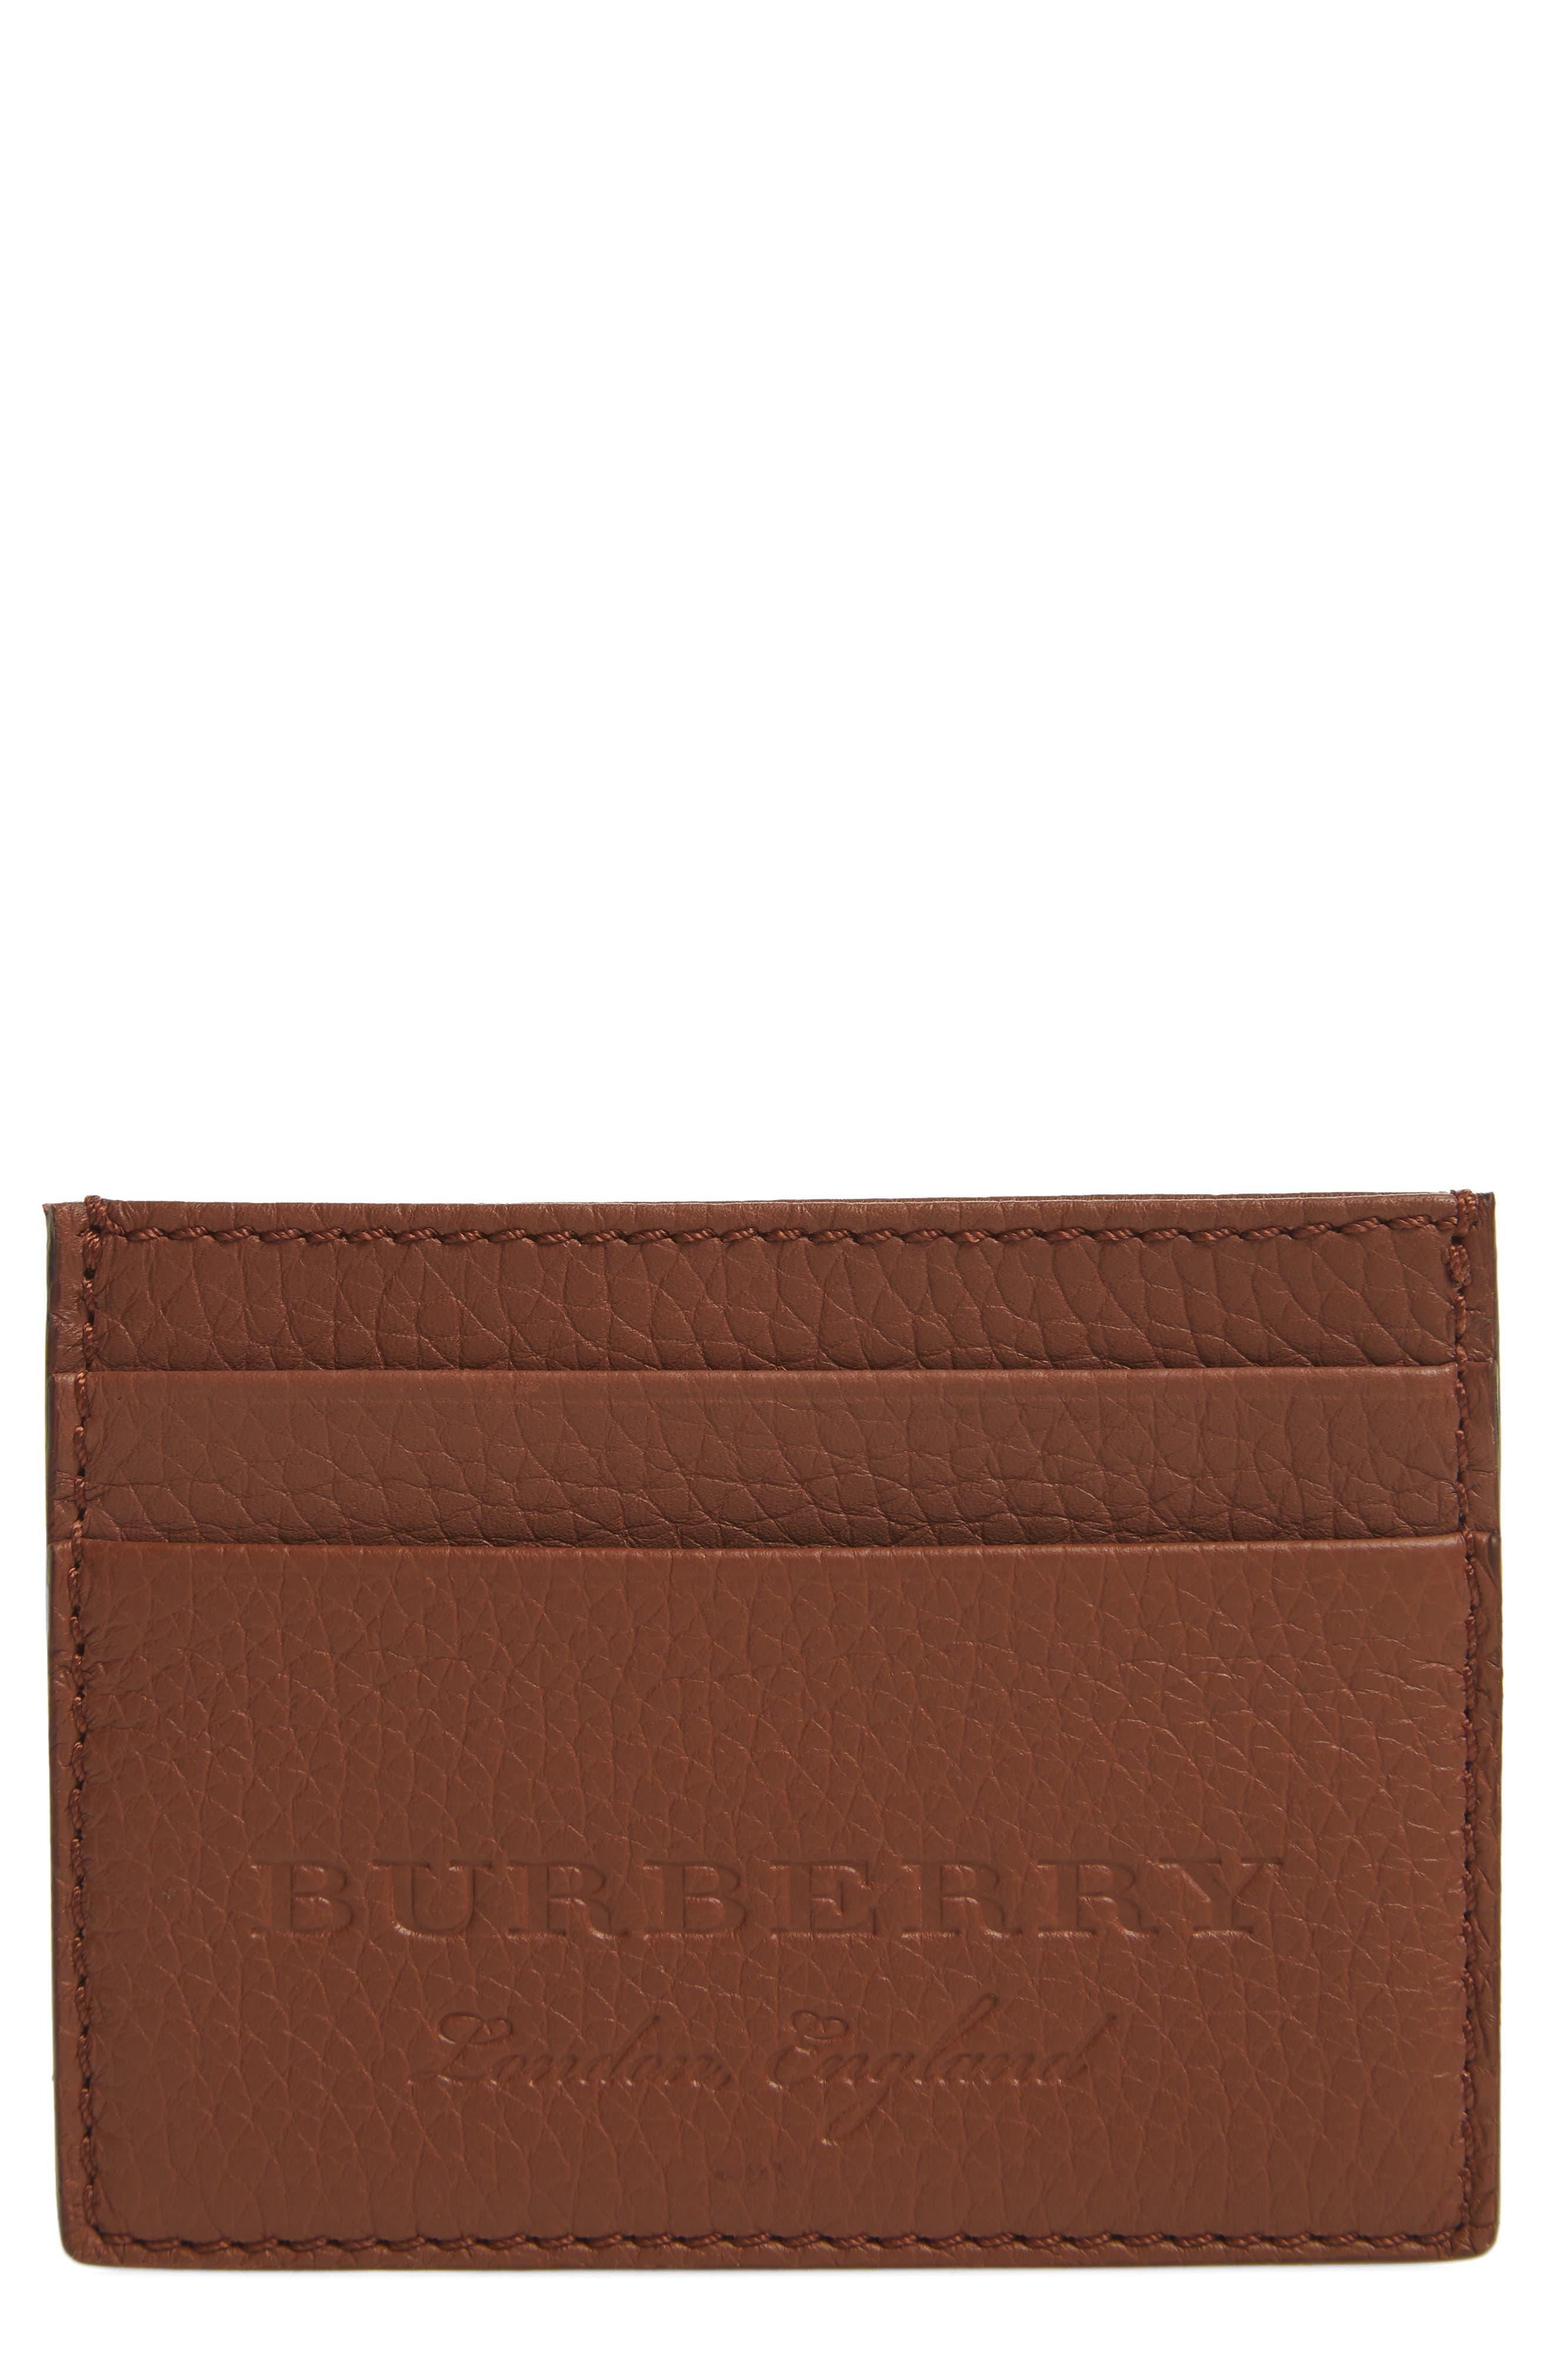 Sandon Leather Card Case,                             Main thumbnail 1, color,                             Chestnut Brown